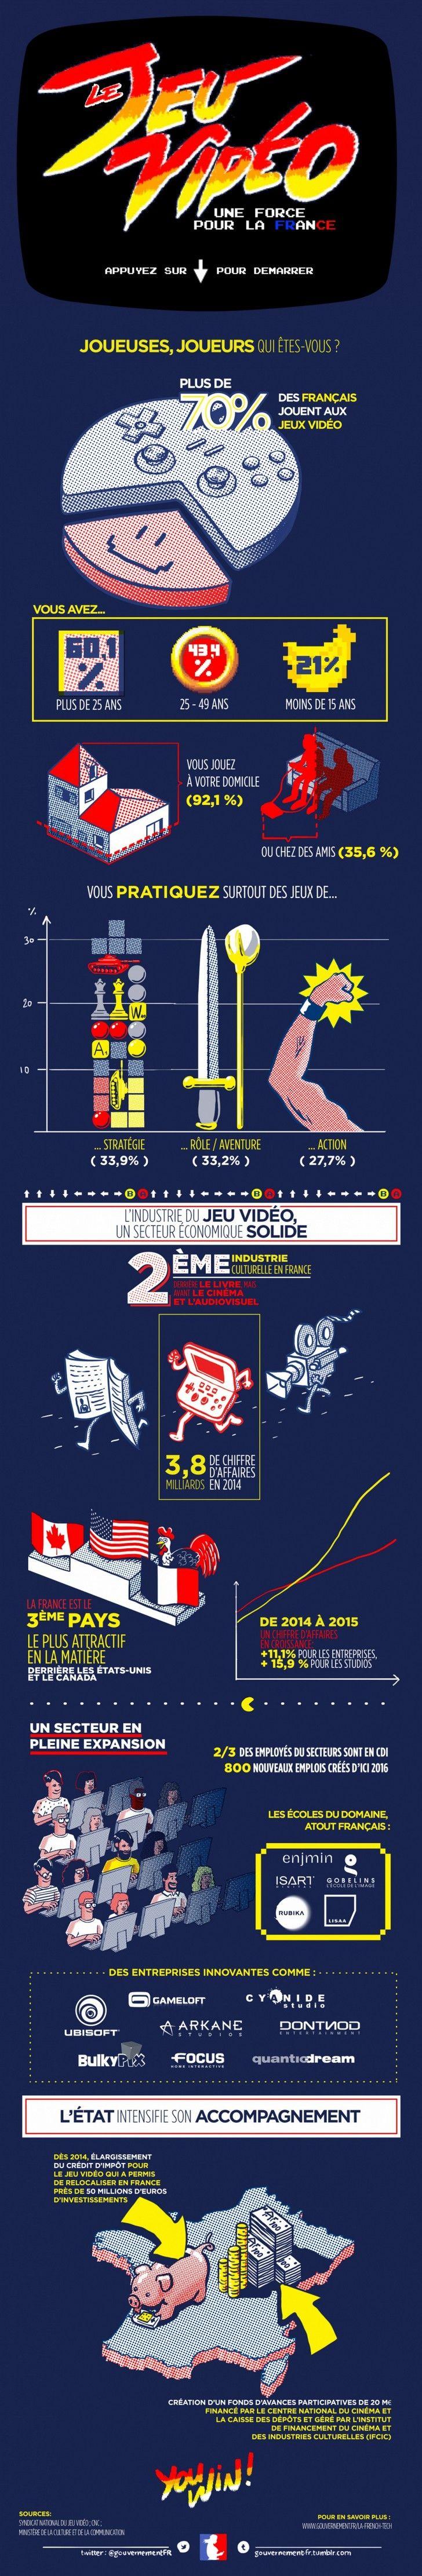 Paris Games Week : le bilan